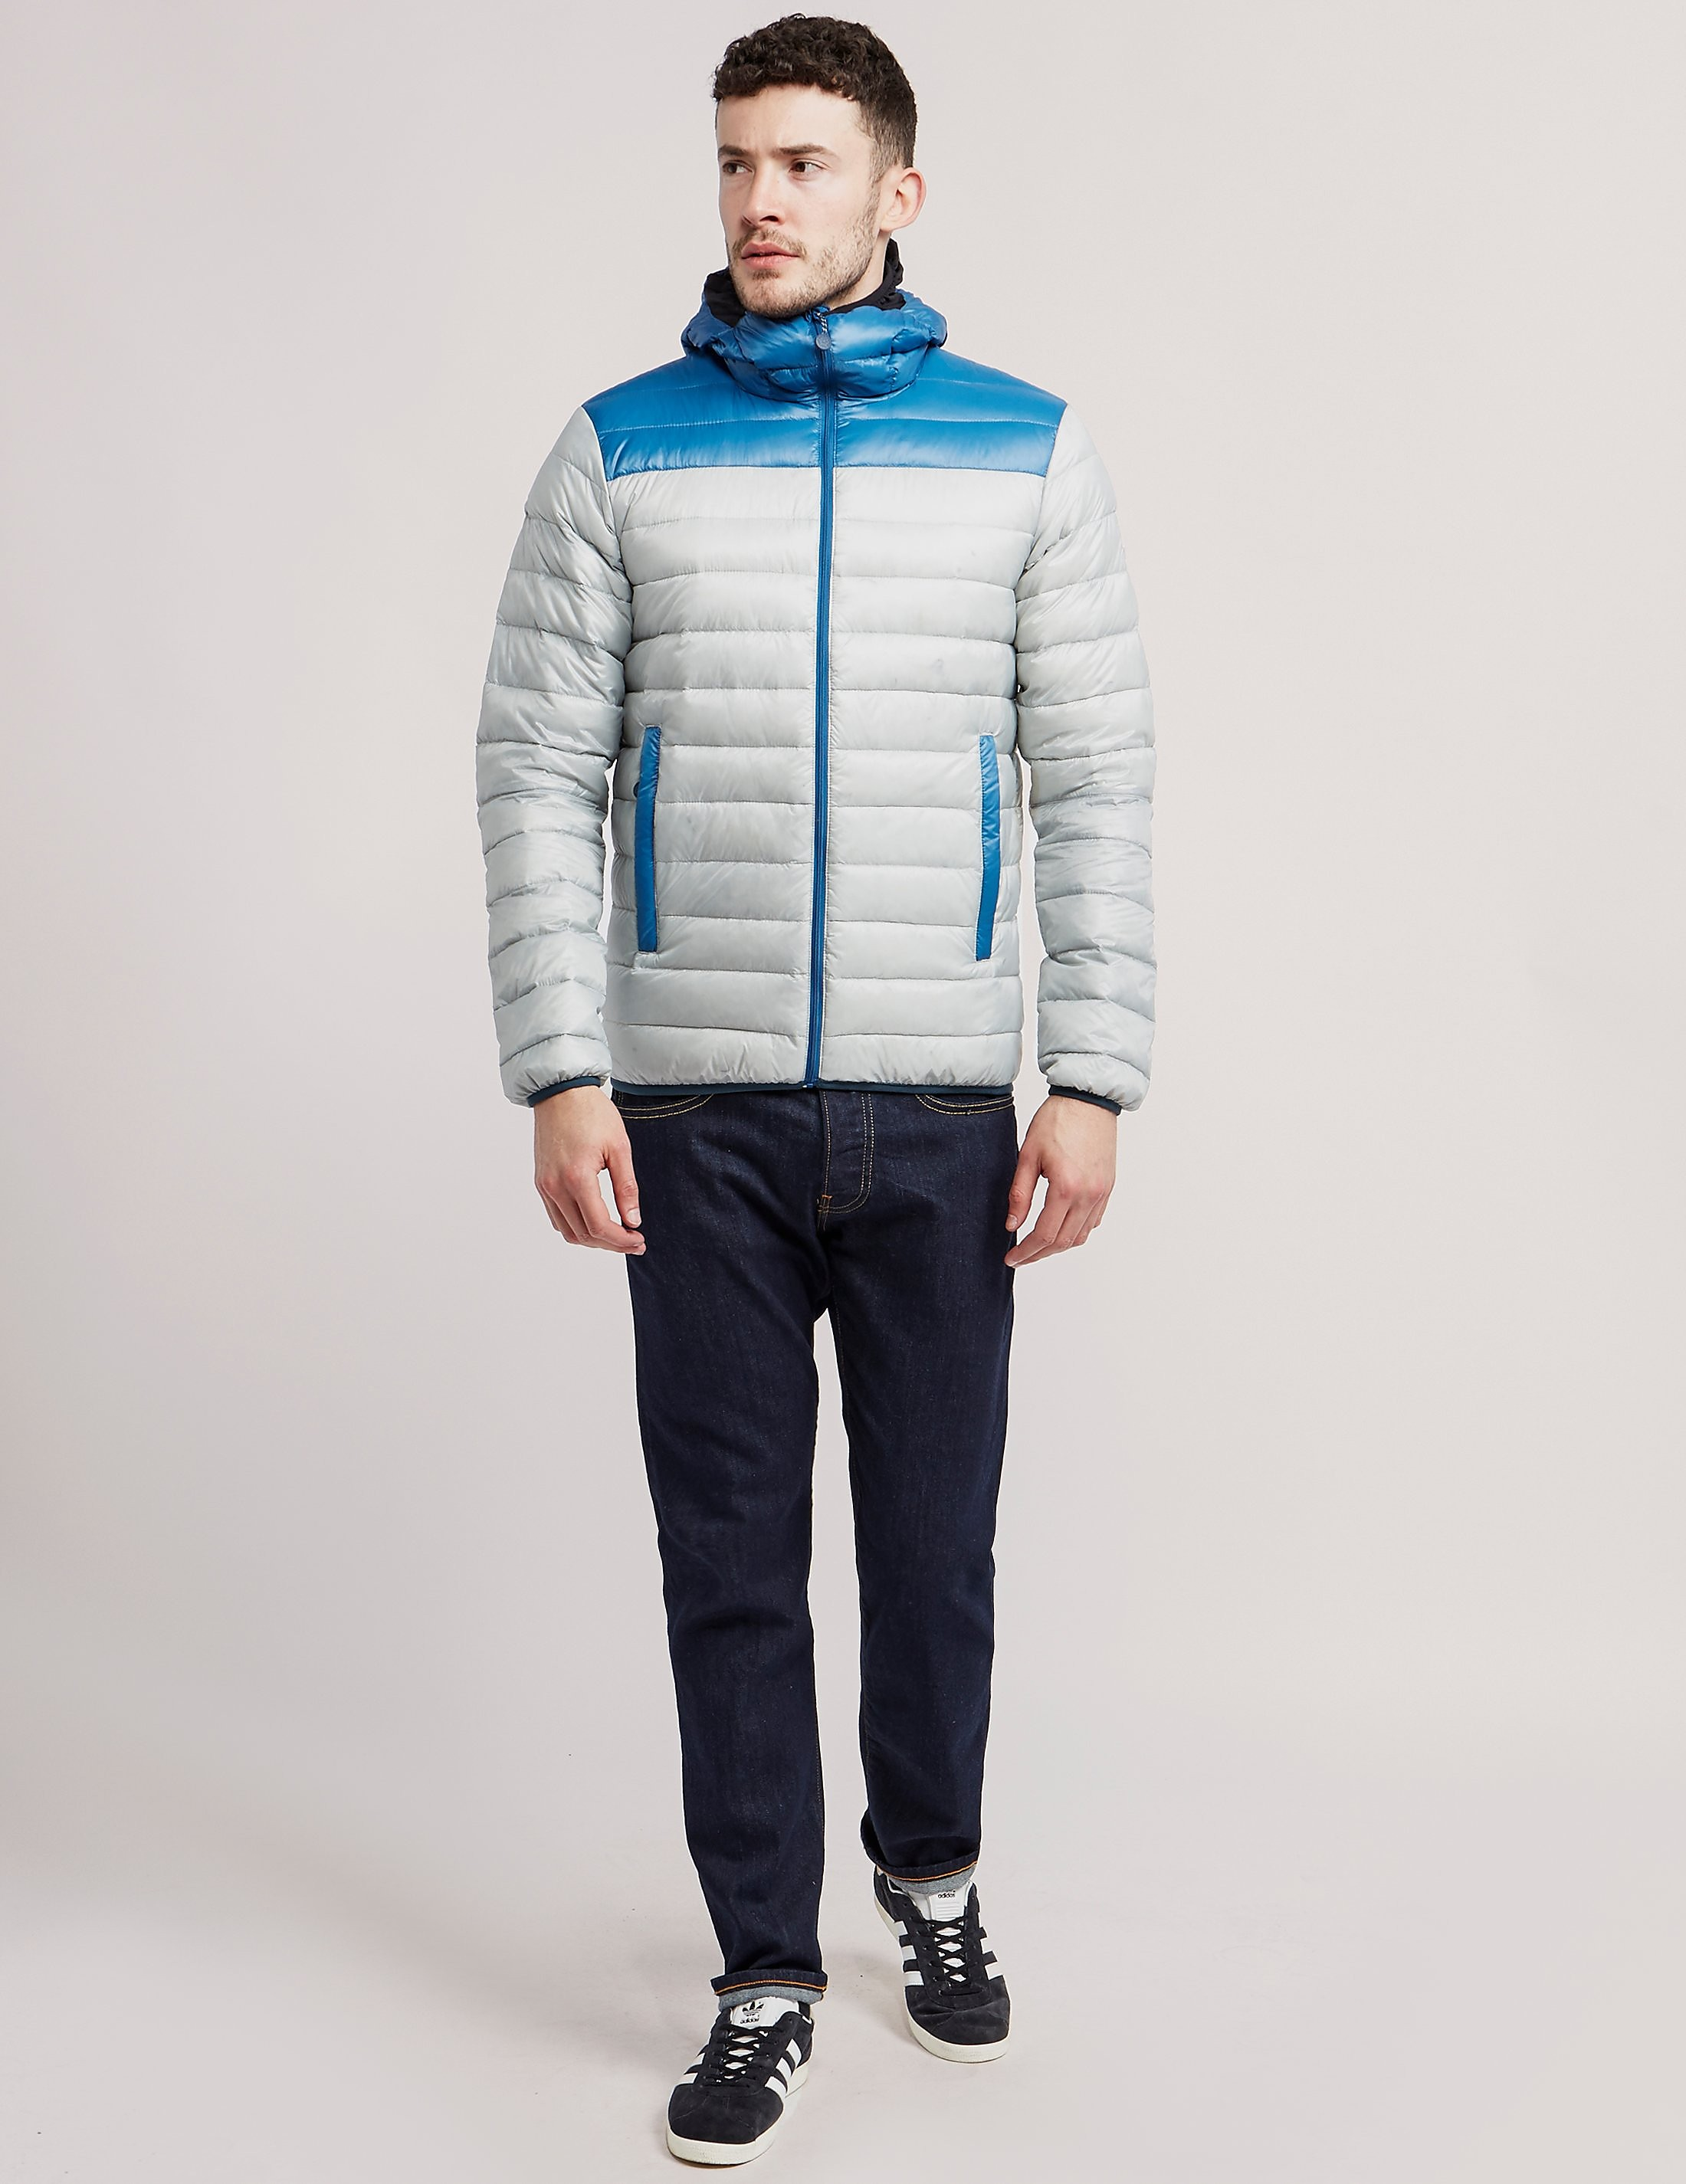 Pyrenex Falco Bubble Jacket